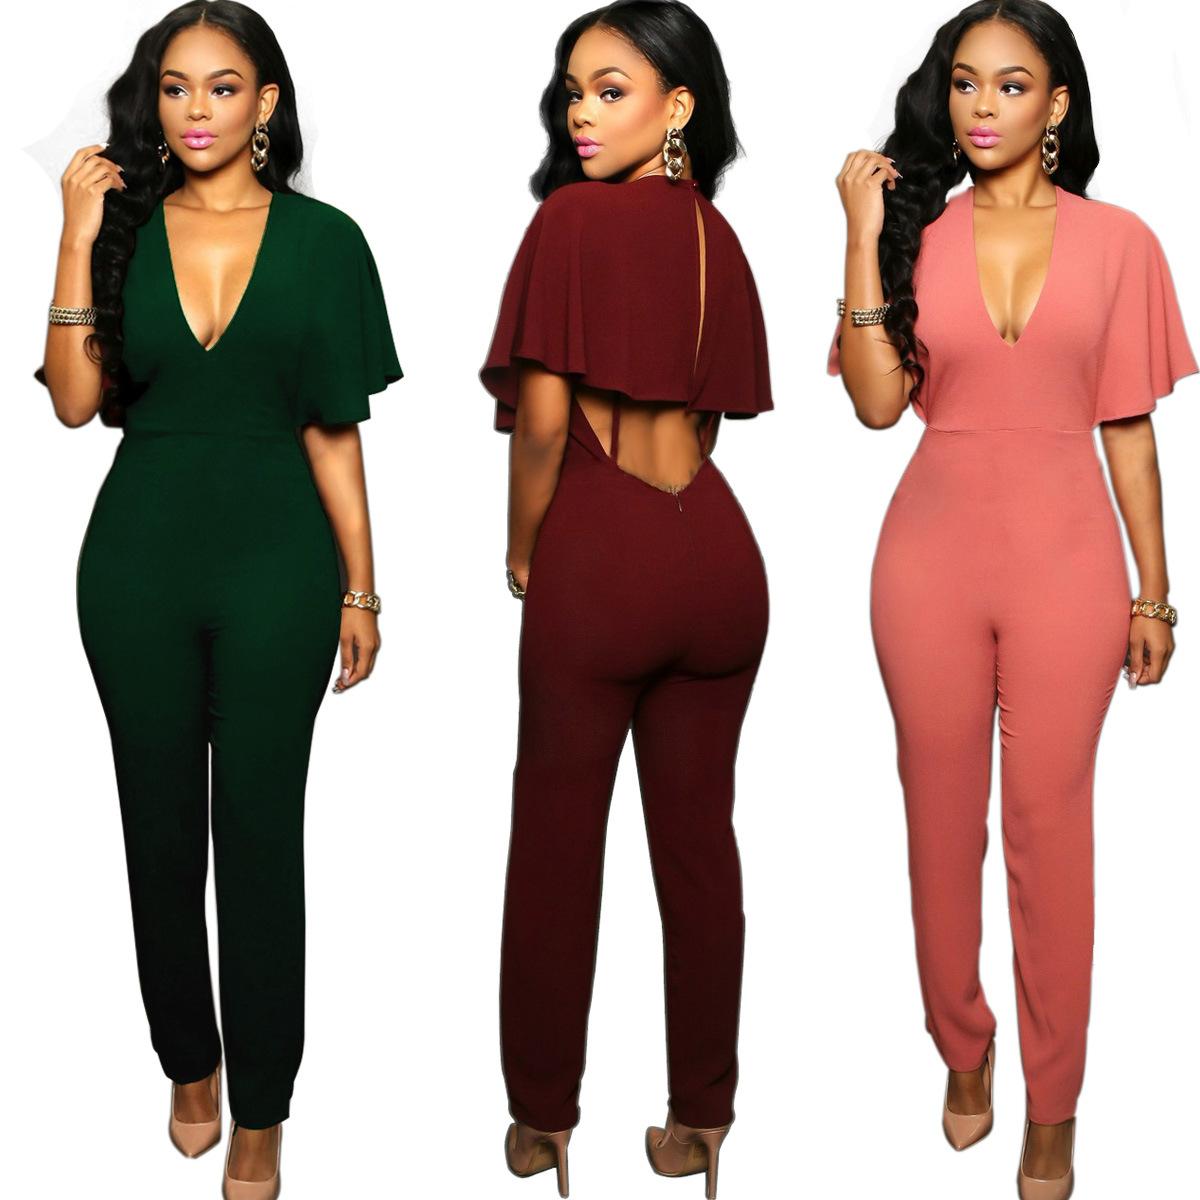 484b250c089 2019 2018 Summer New Explosion Models Best Selling Fashion Women S ...